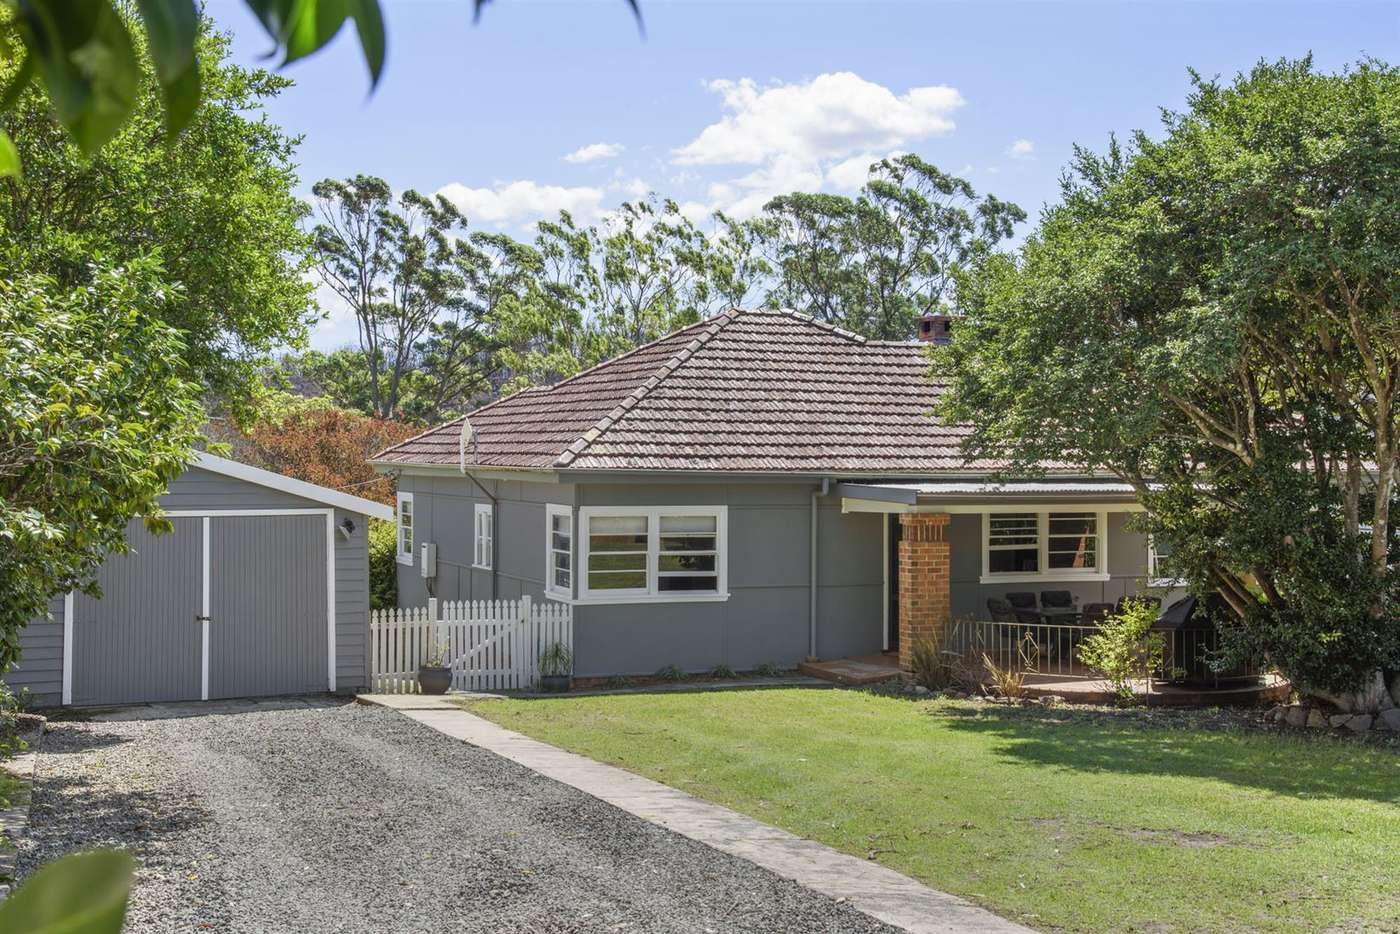 Main view of Homely house listing, 129 Lake Conjola Entrance Road, Lake Conjola NSW 2539